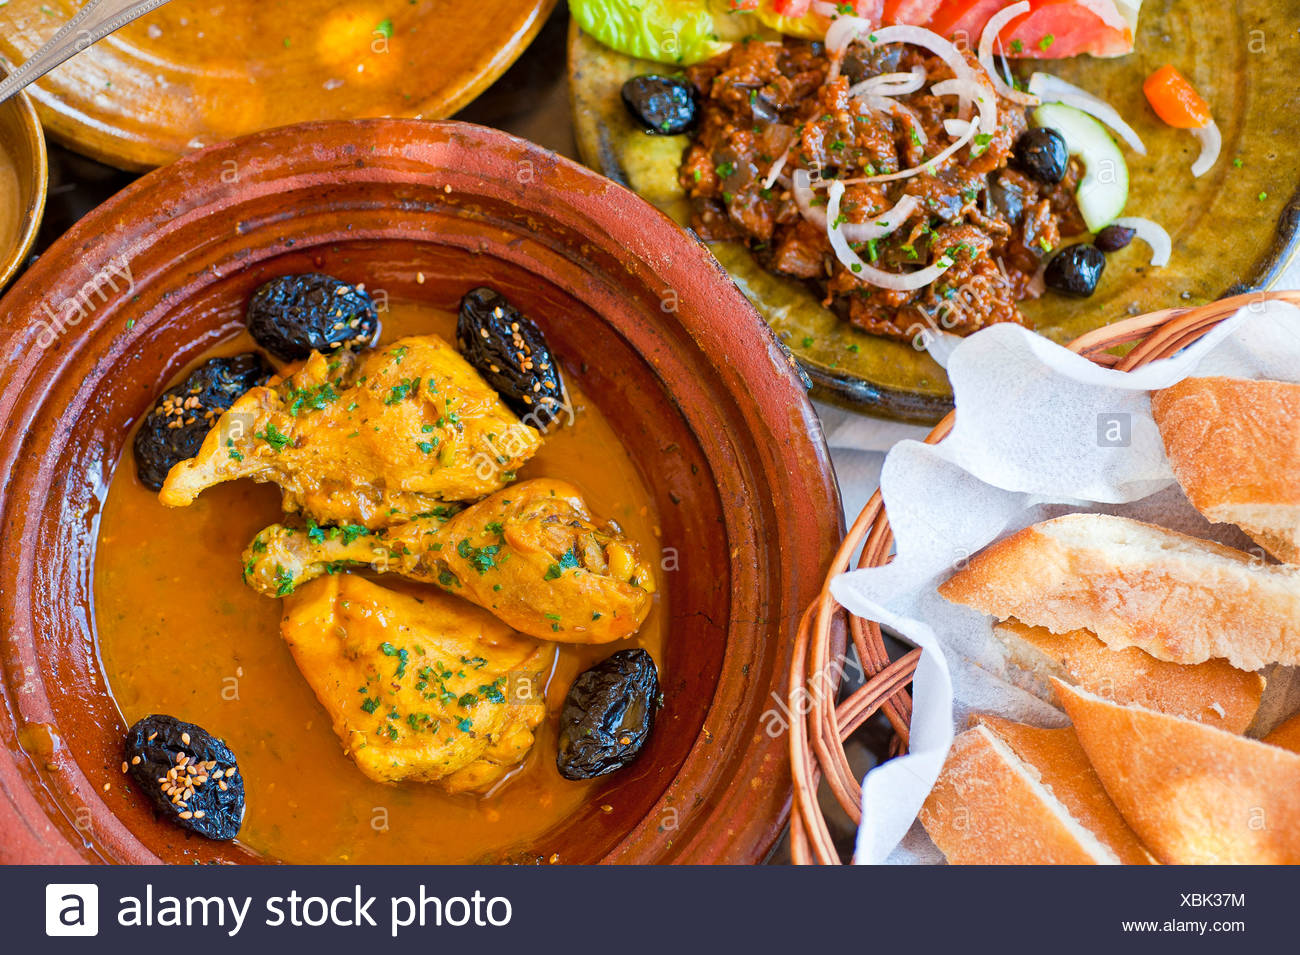 Merveilleux Traditionelle Marokkanische Küche, Essen, Tajine, Tajine Oder Tajin Mit  Huhn Und Backpflaumen, Marokko, Afrika